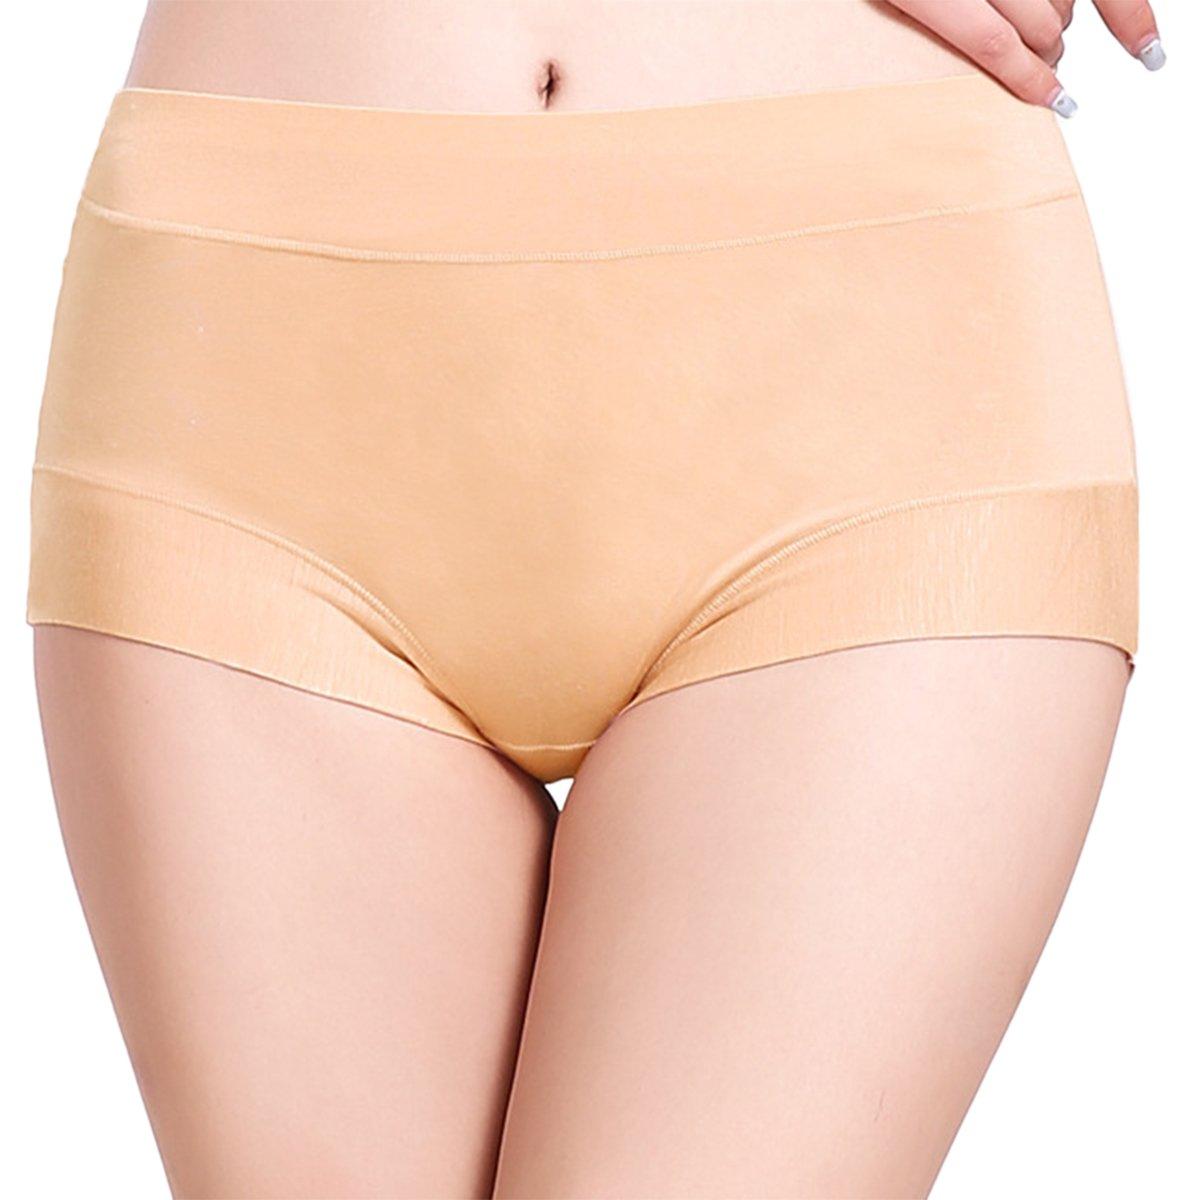 LAPAYA Women's Underwear Stretch Mid Rise Comfort Soft Boyshort Panties-2 Pack